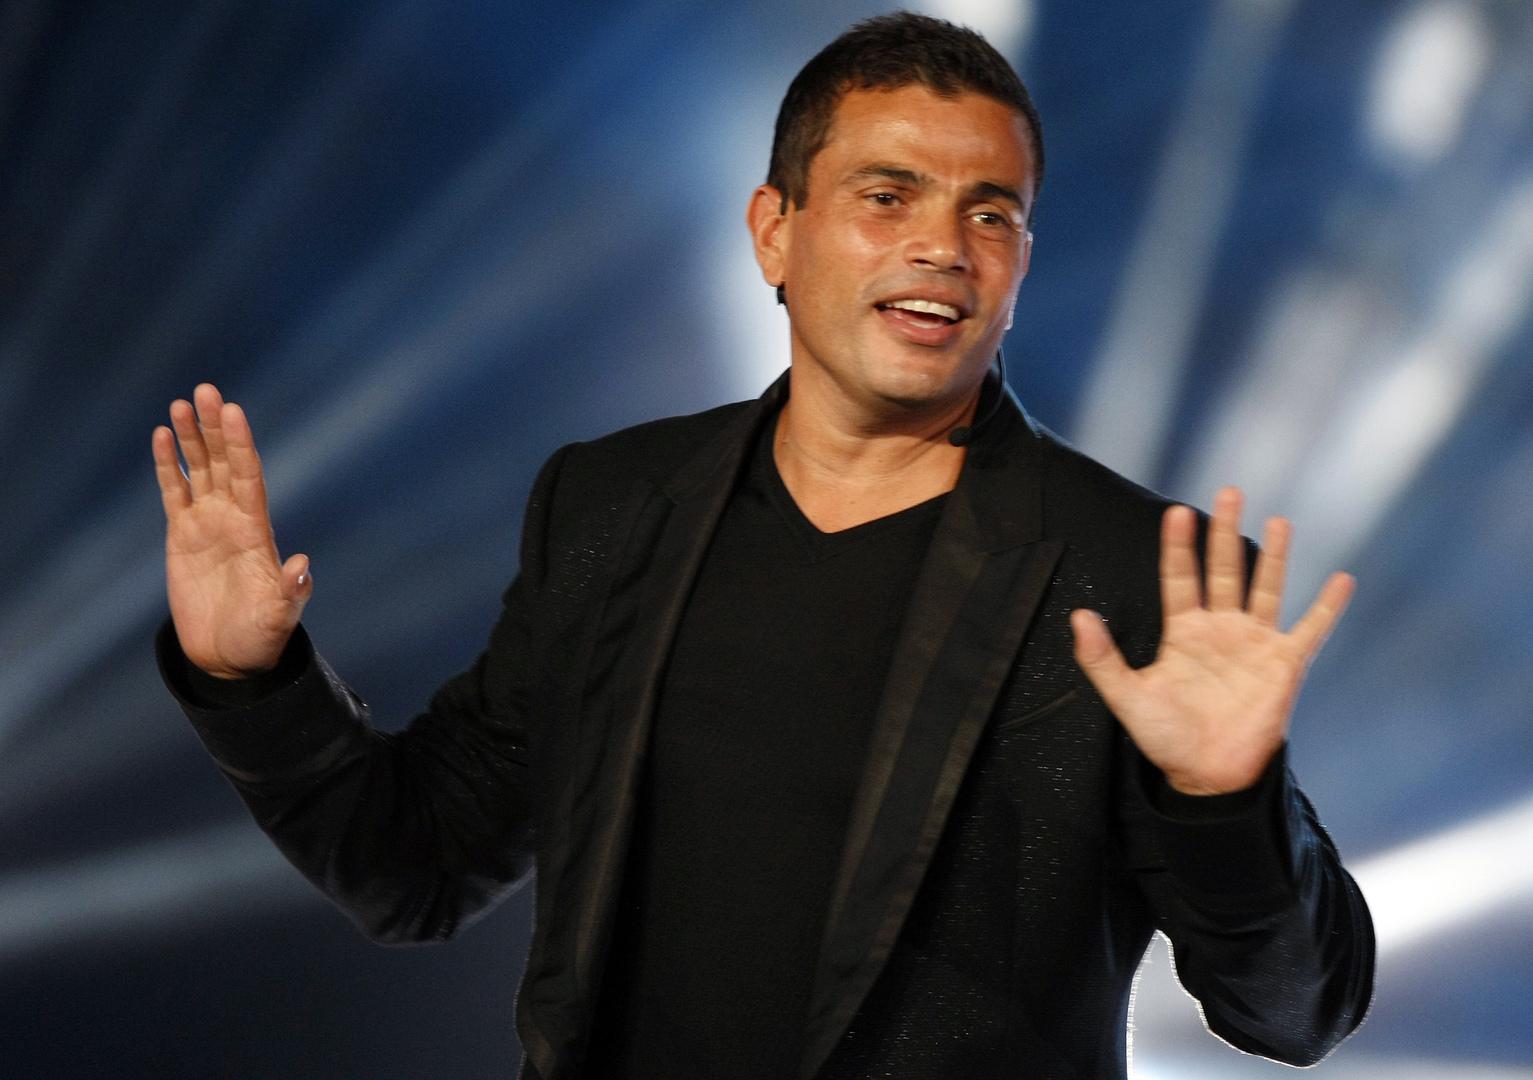 عمرو دياب معلقا على ظهور تركي آل شيخ مع رامز جلال: